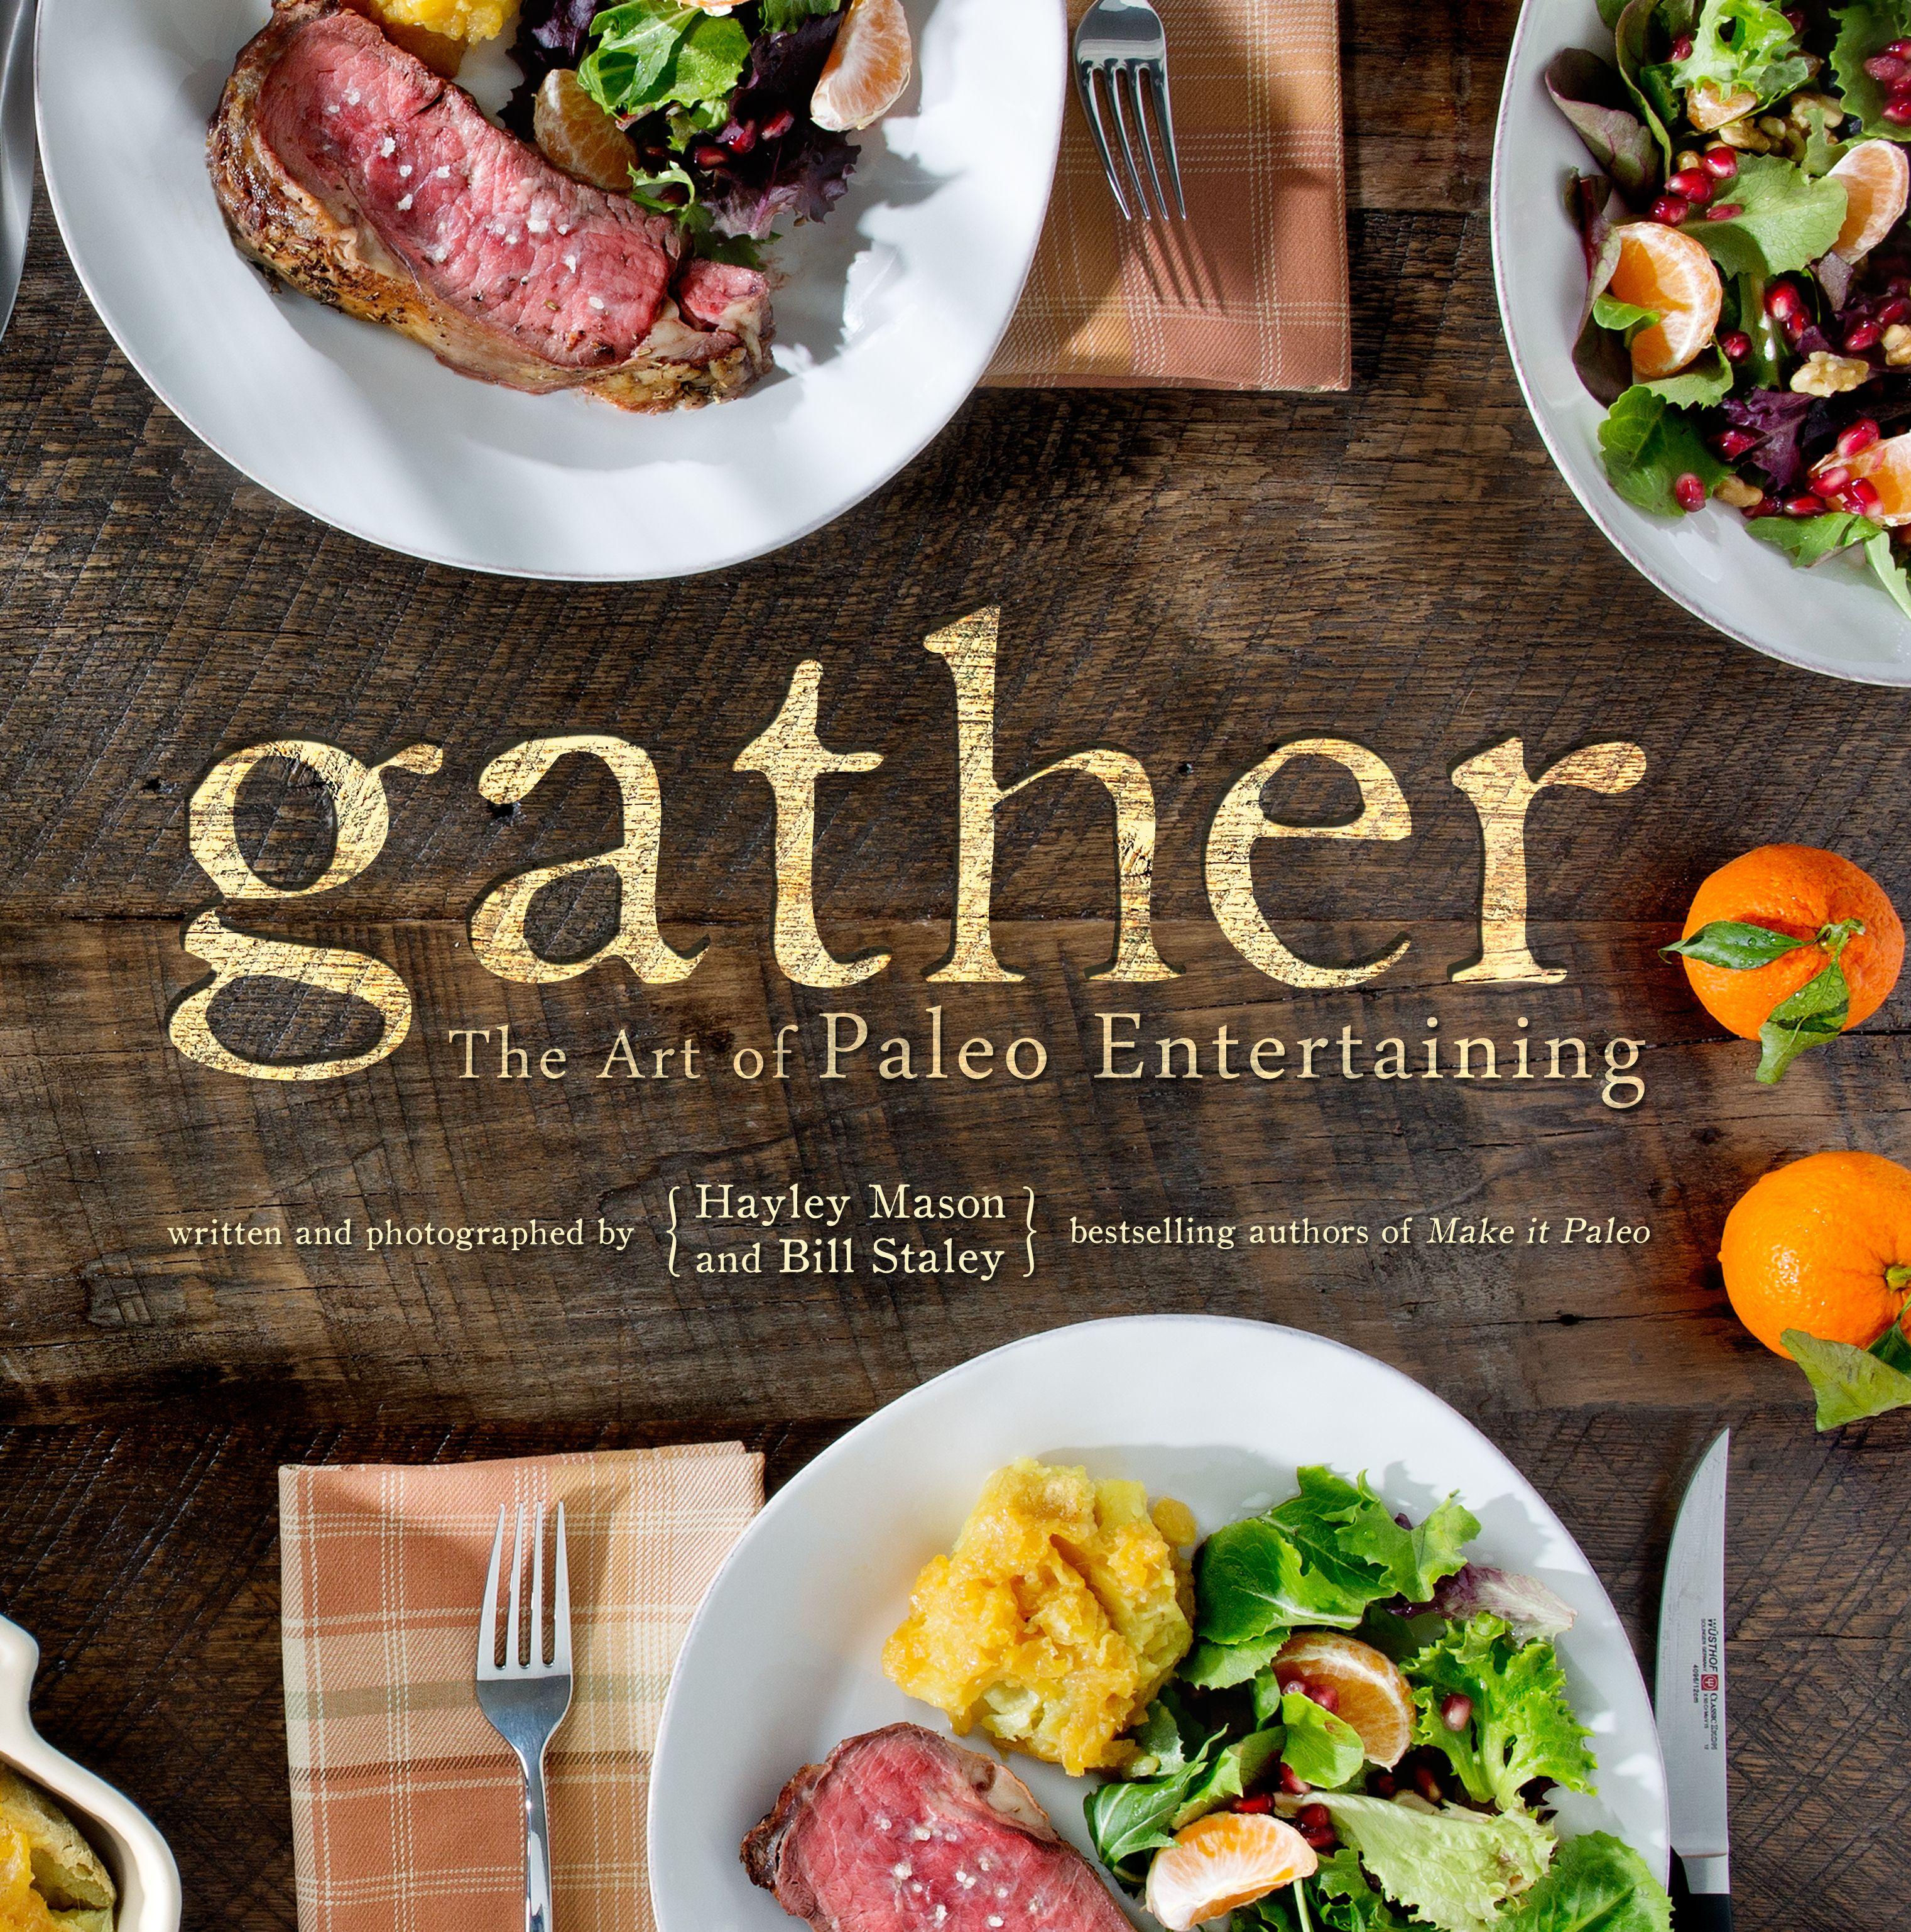 Fishpond New Zealand, Gather: The Art of Paleo Entertaining by Hayley Mason  Bill Staley. Buy Books online: Gather: The Art of Paleo Entertaining, ...